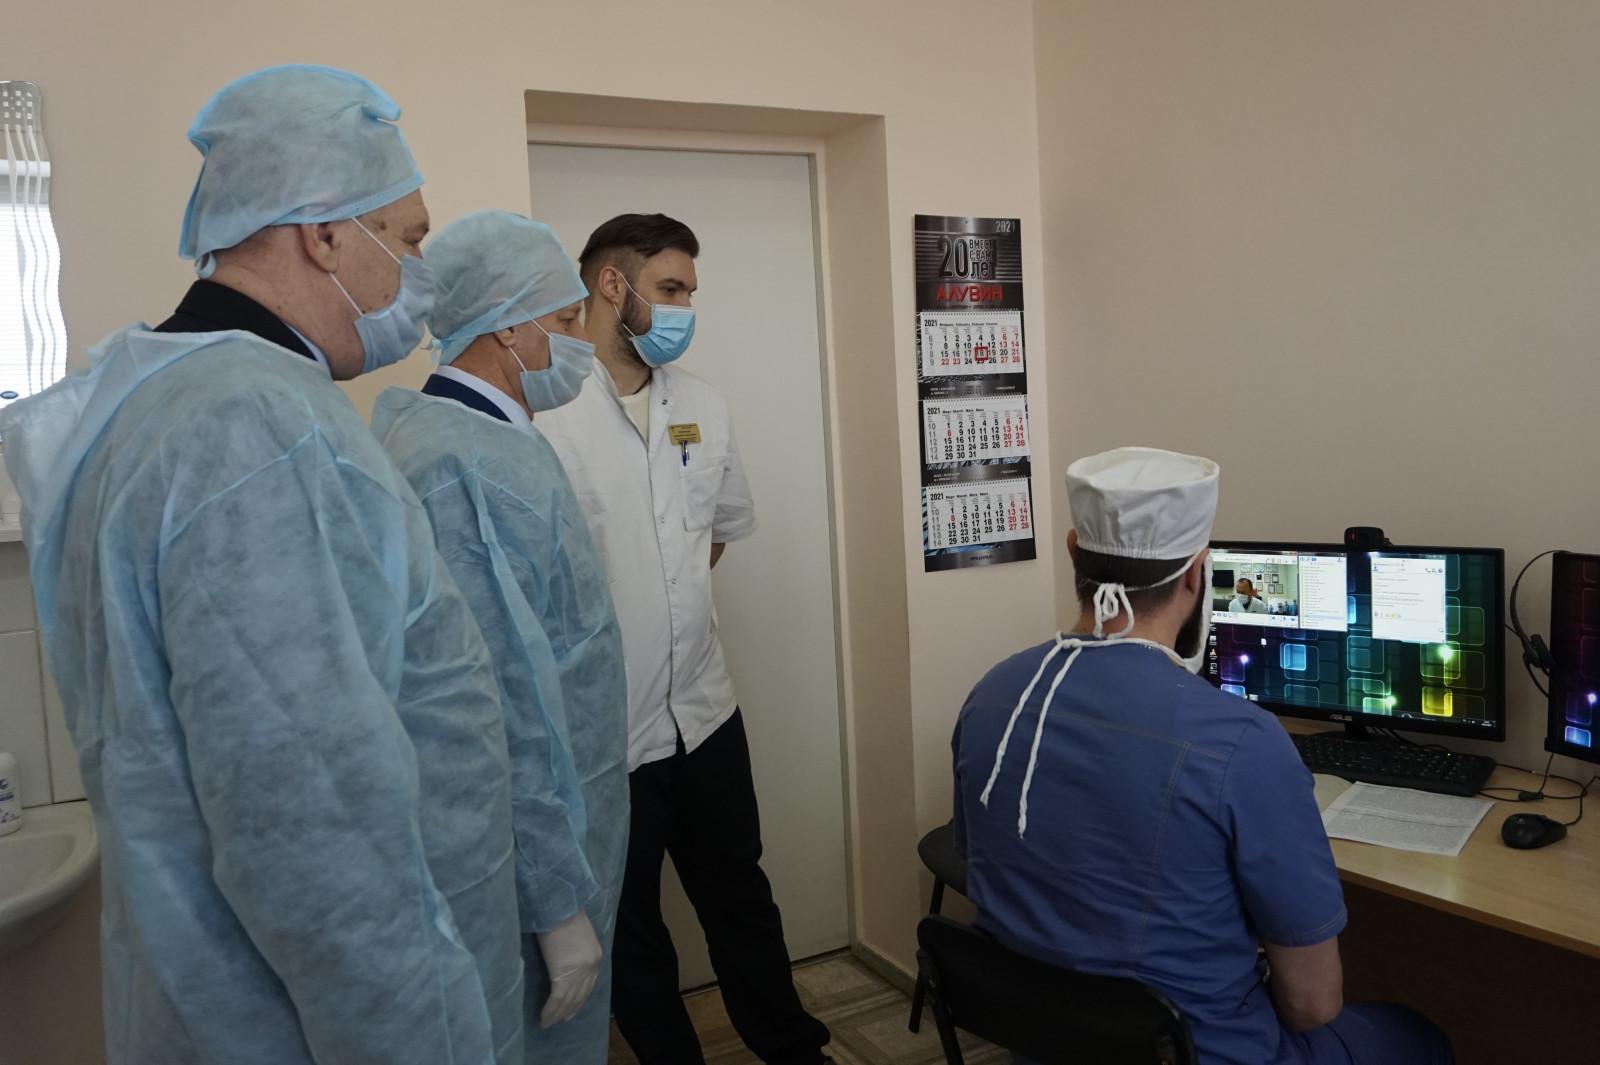 В реализации проекта «Удаленная телемедицина» помогает «Система-112»